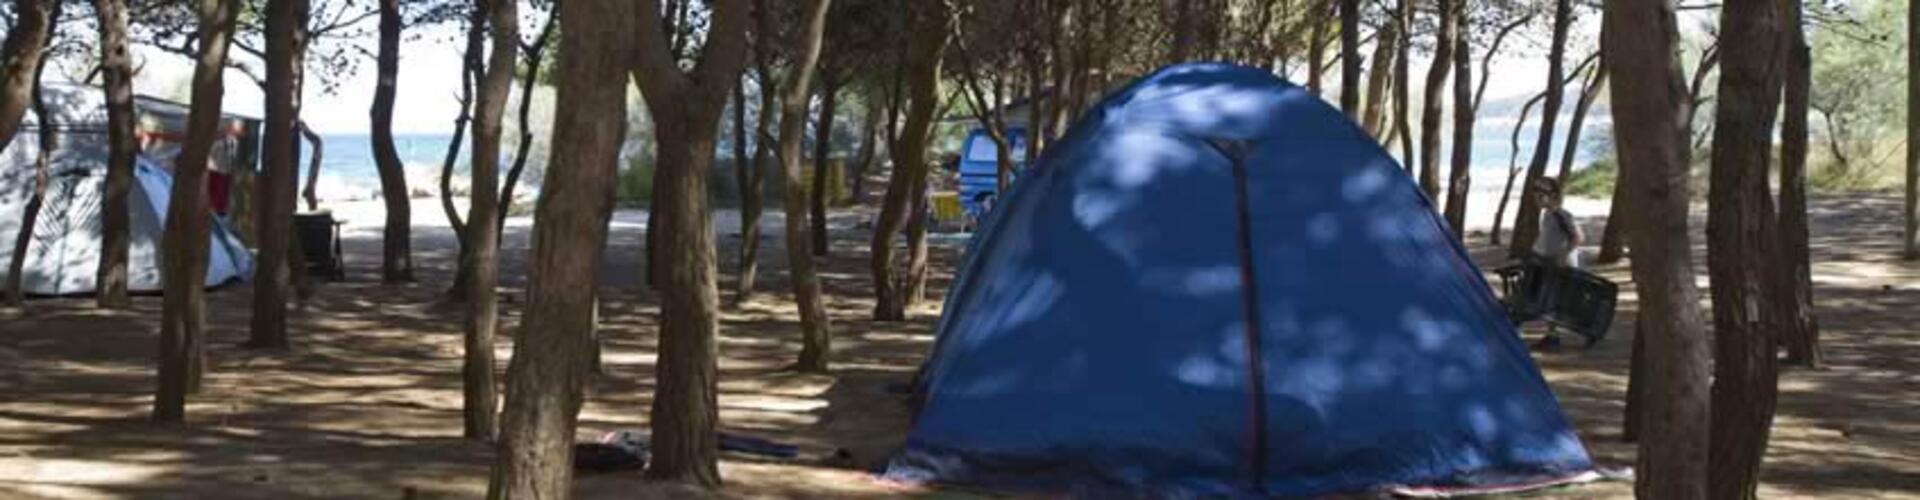 lavecchiatorregallipoli en camping 008